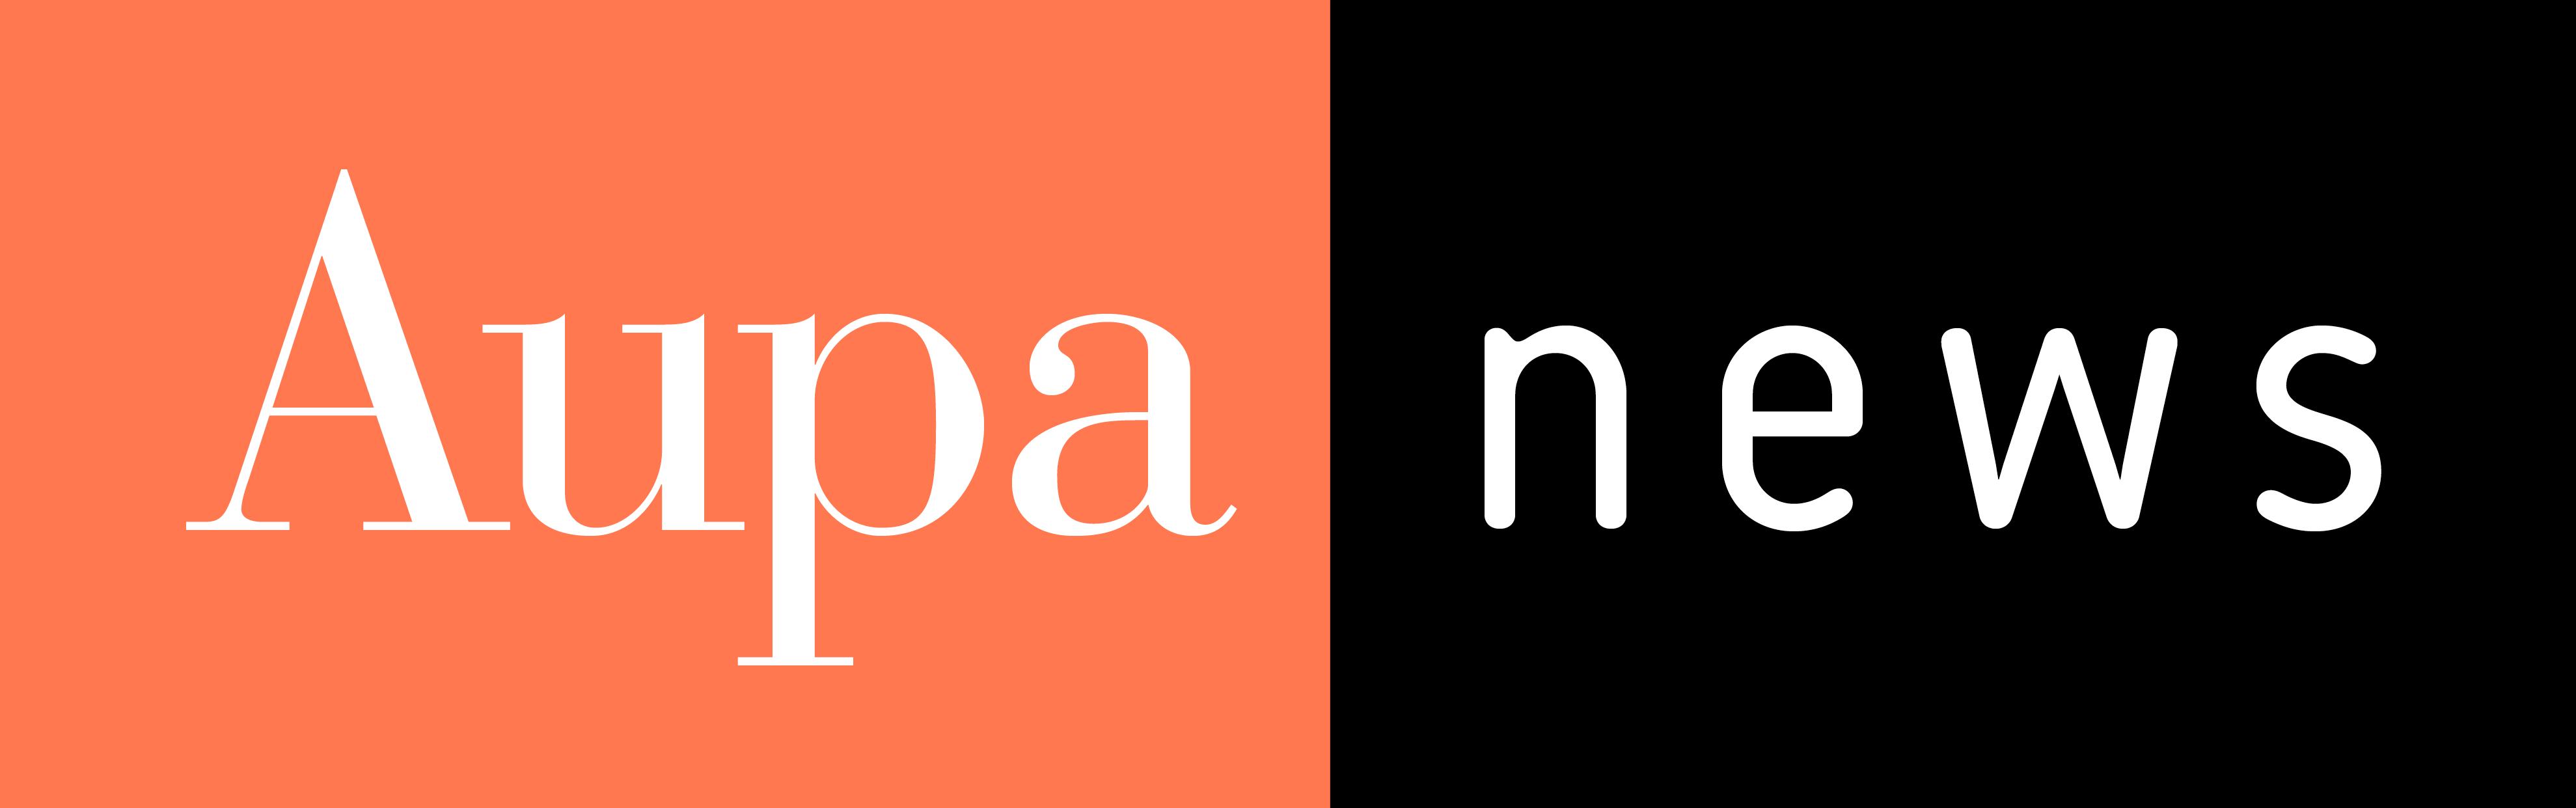 Aupa News